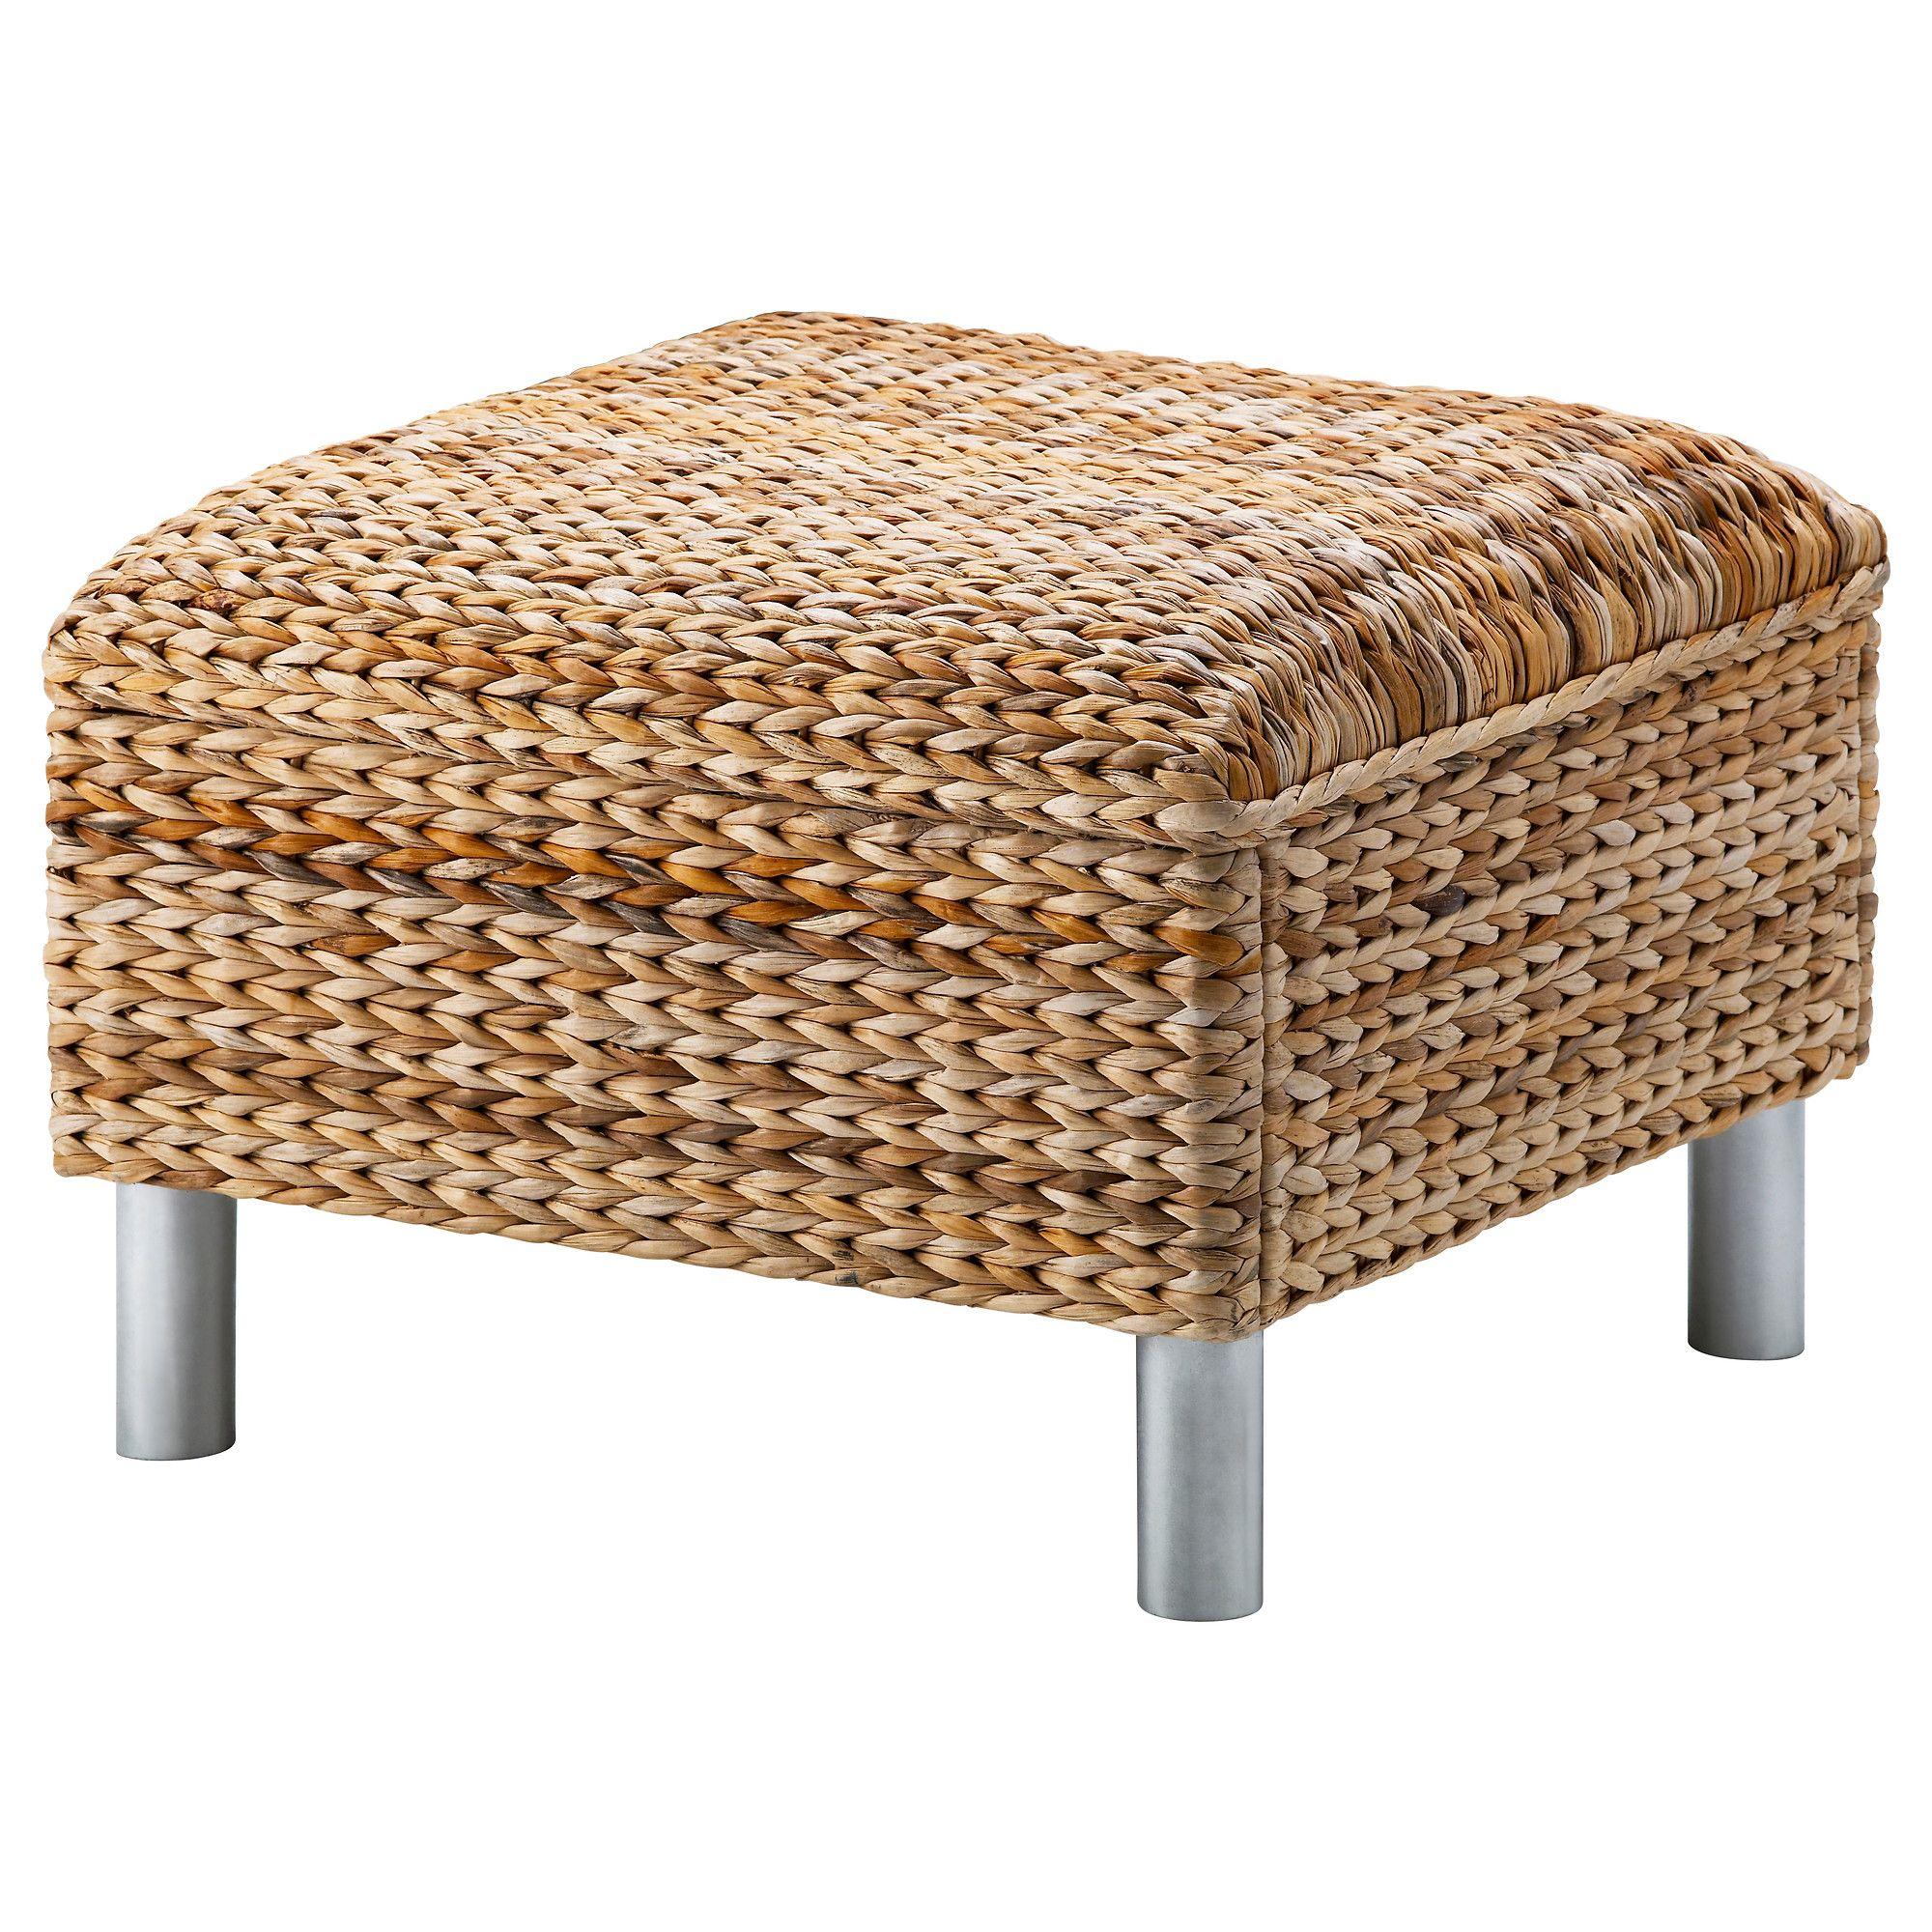 klippan pouf ikea decoco ikea footstool rattan stool und ikea furniture. Black Bedroom Furniture Sets. Home Design Ideas